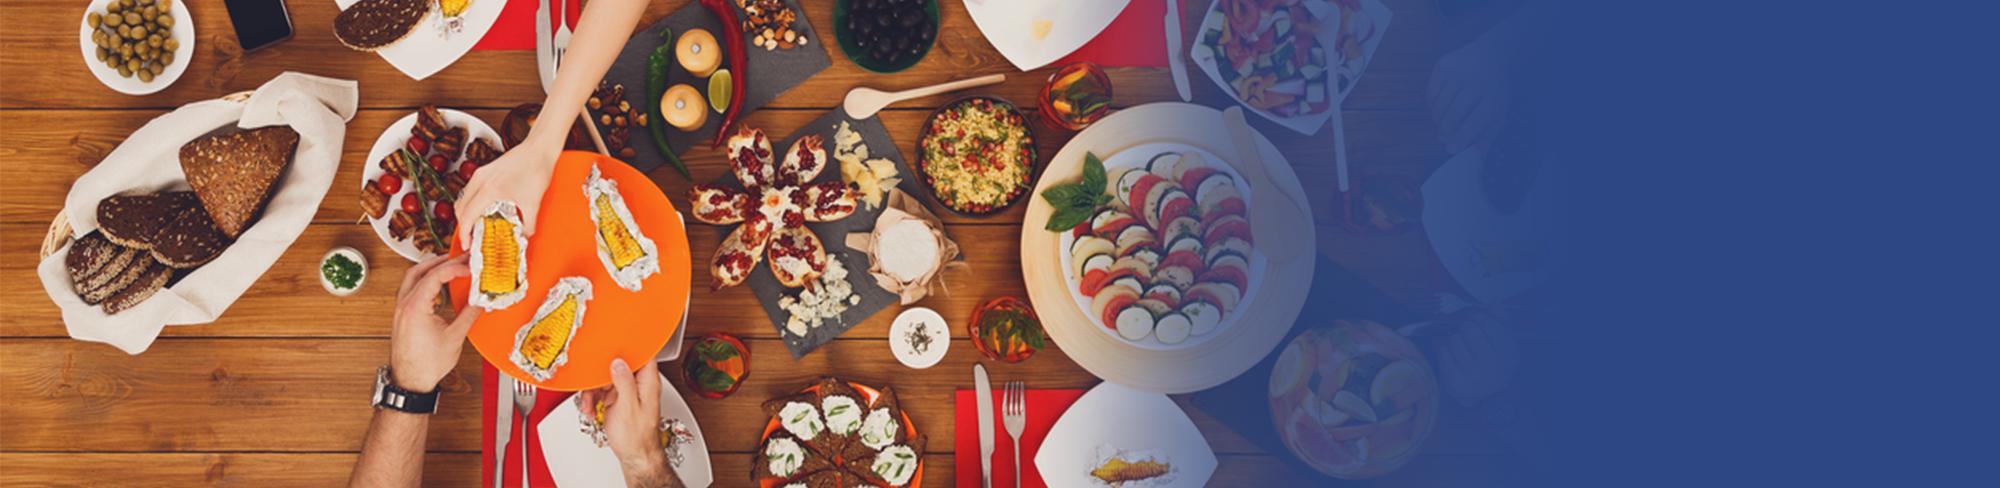 Restaurants new header 2016-3.png